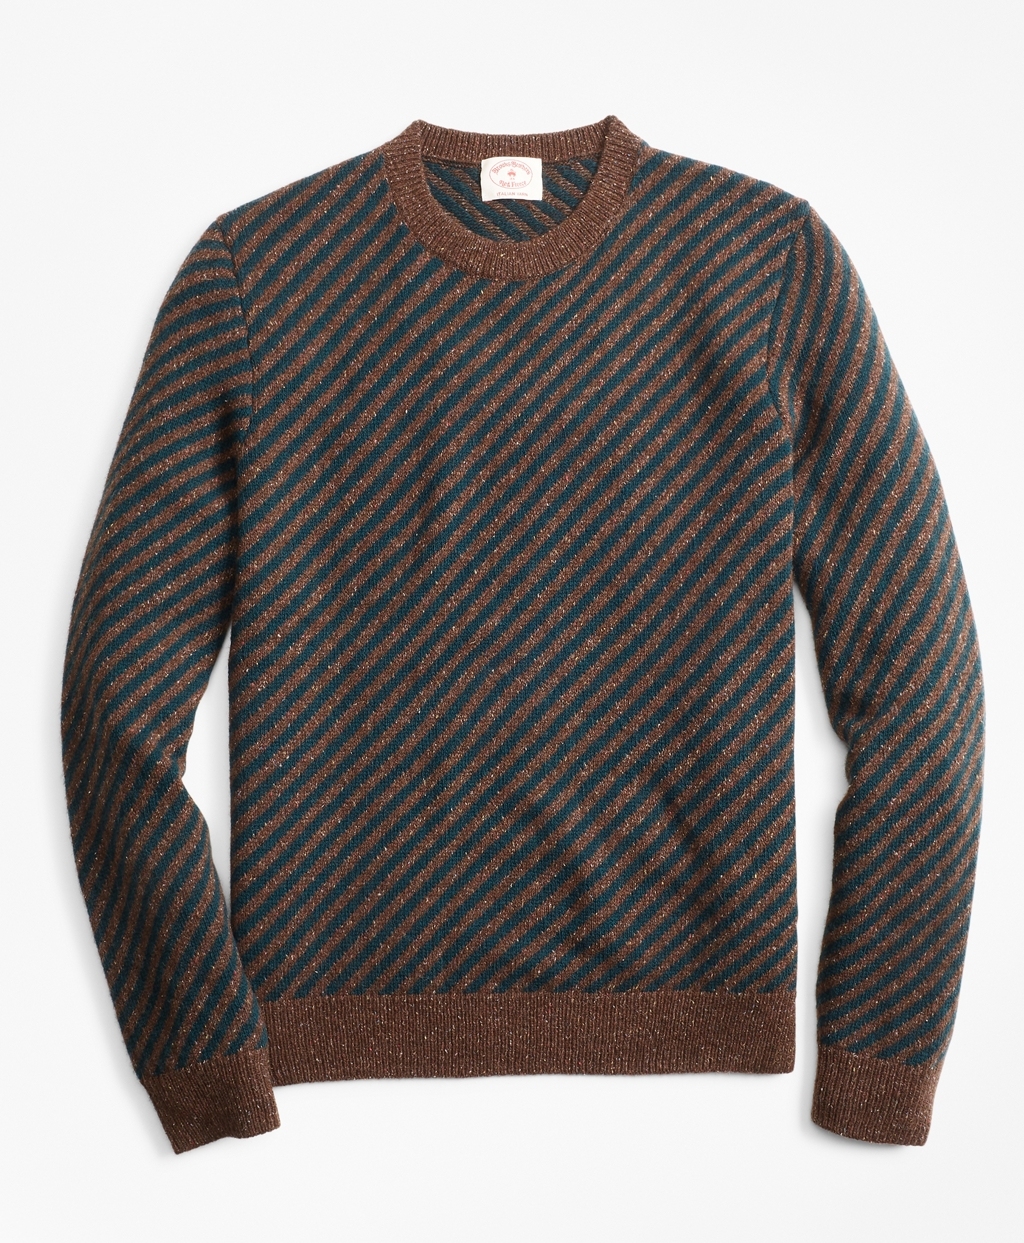 Men's Vintage Style Clothing Brooks Brothers Mens Diagonal-Stripe Alpaca-Blend Crewneck Sweater $89.50 AT vintagedancer.com